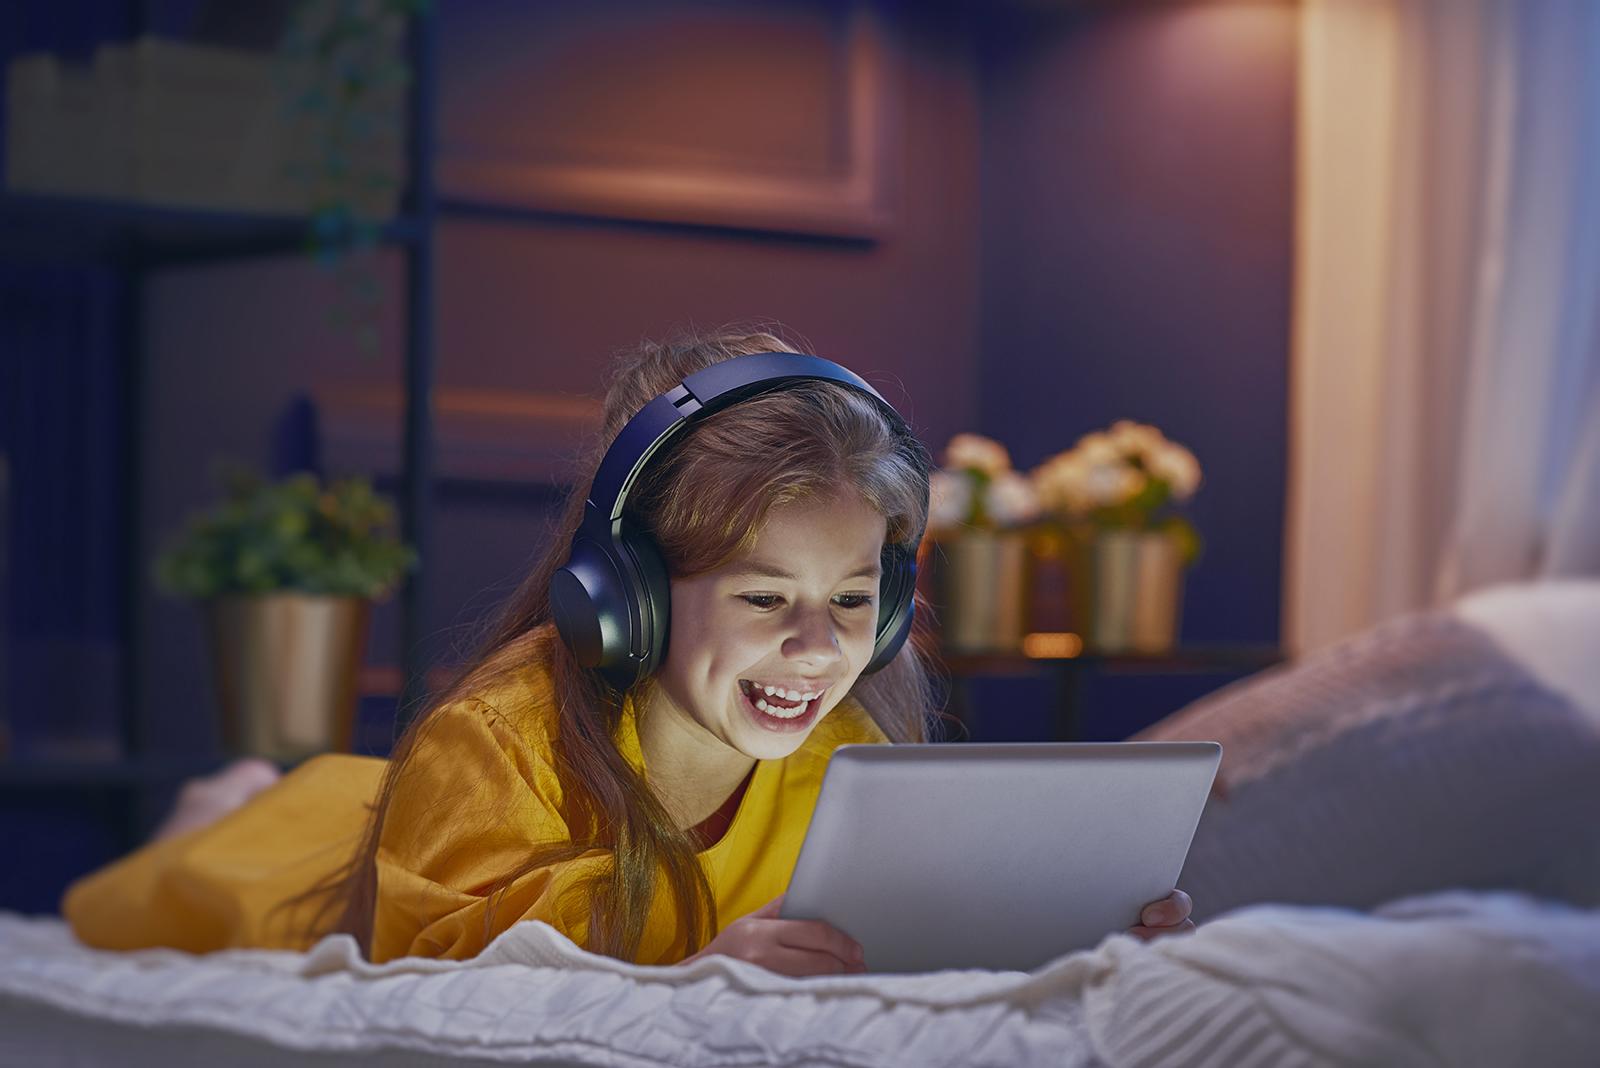 WarnerMedia International and Precise TV Partner to Evolve YouTube kidSAFE-Certified Advertising